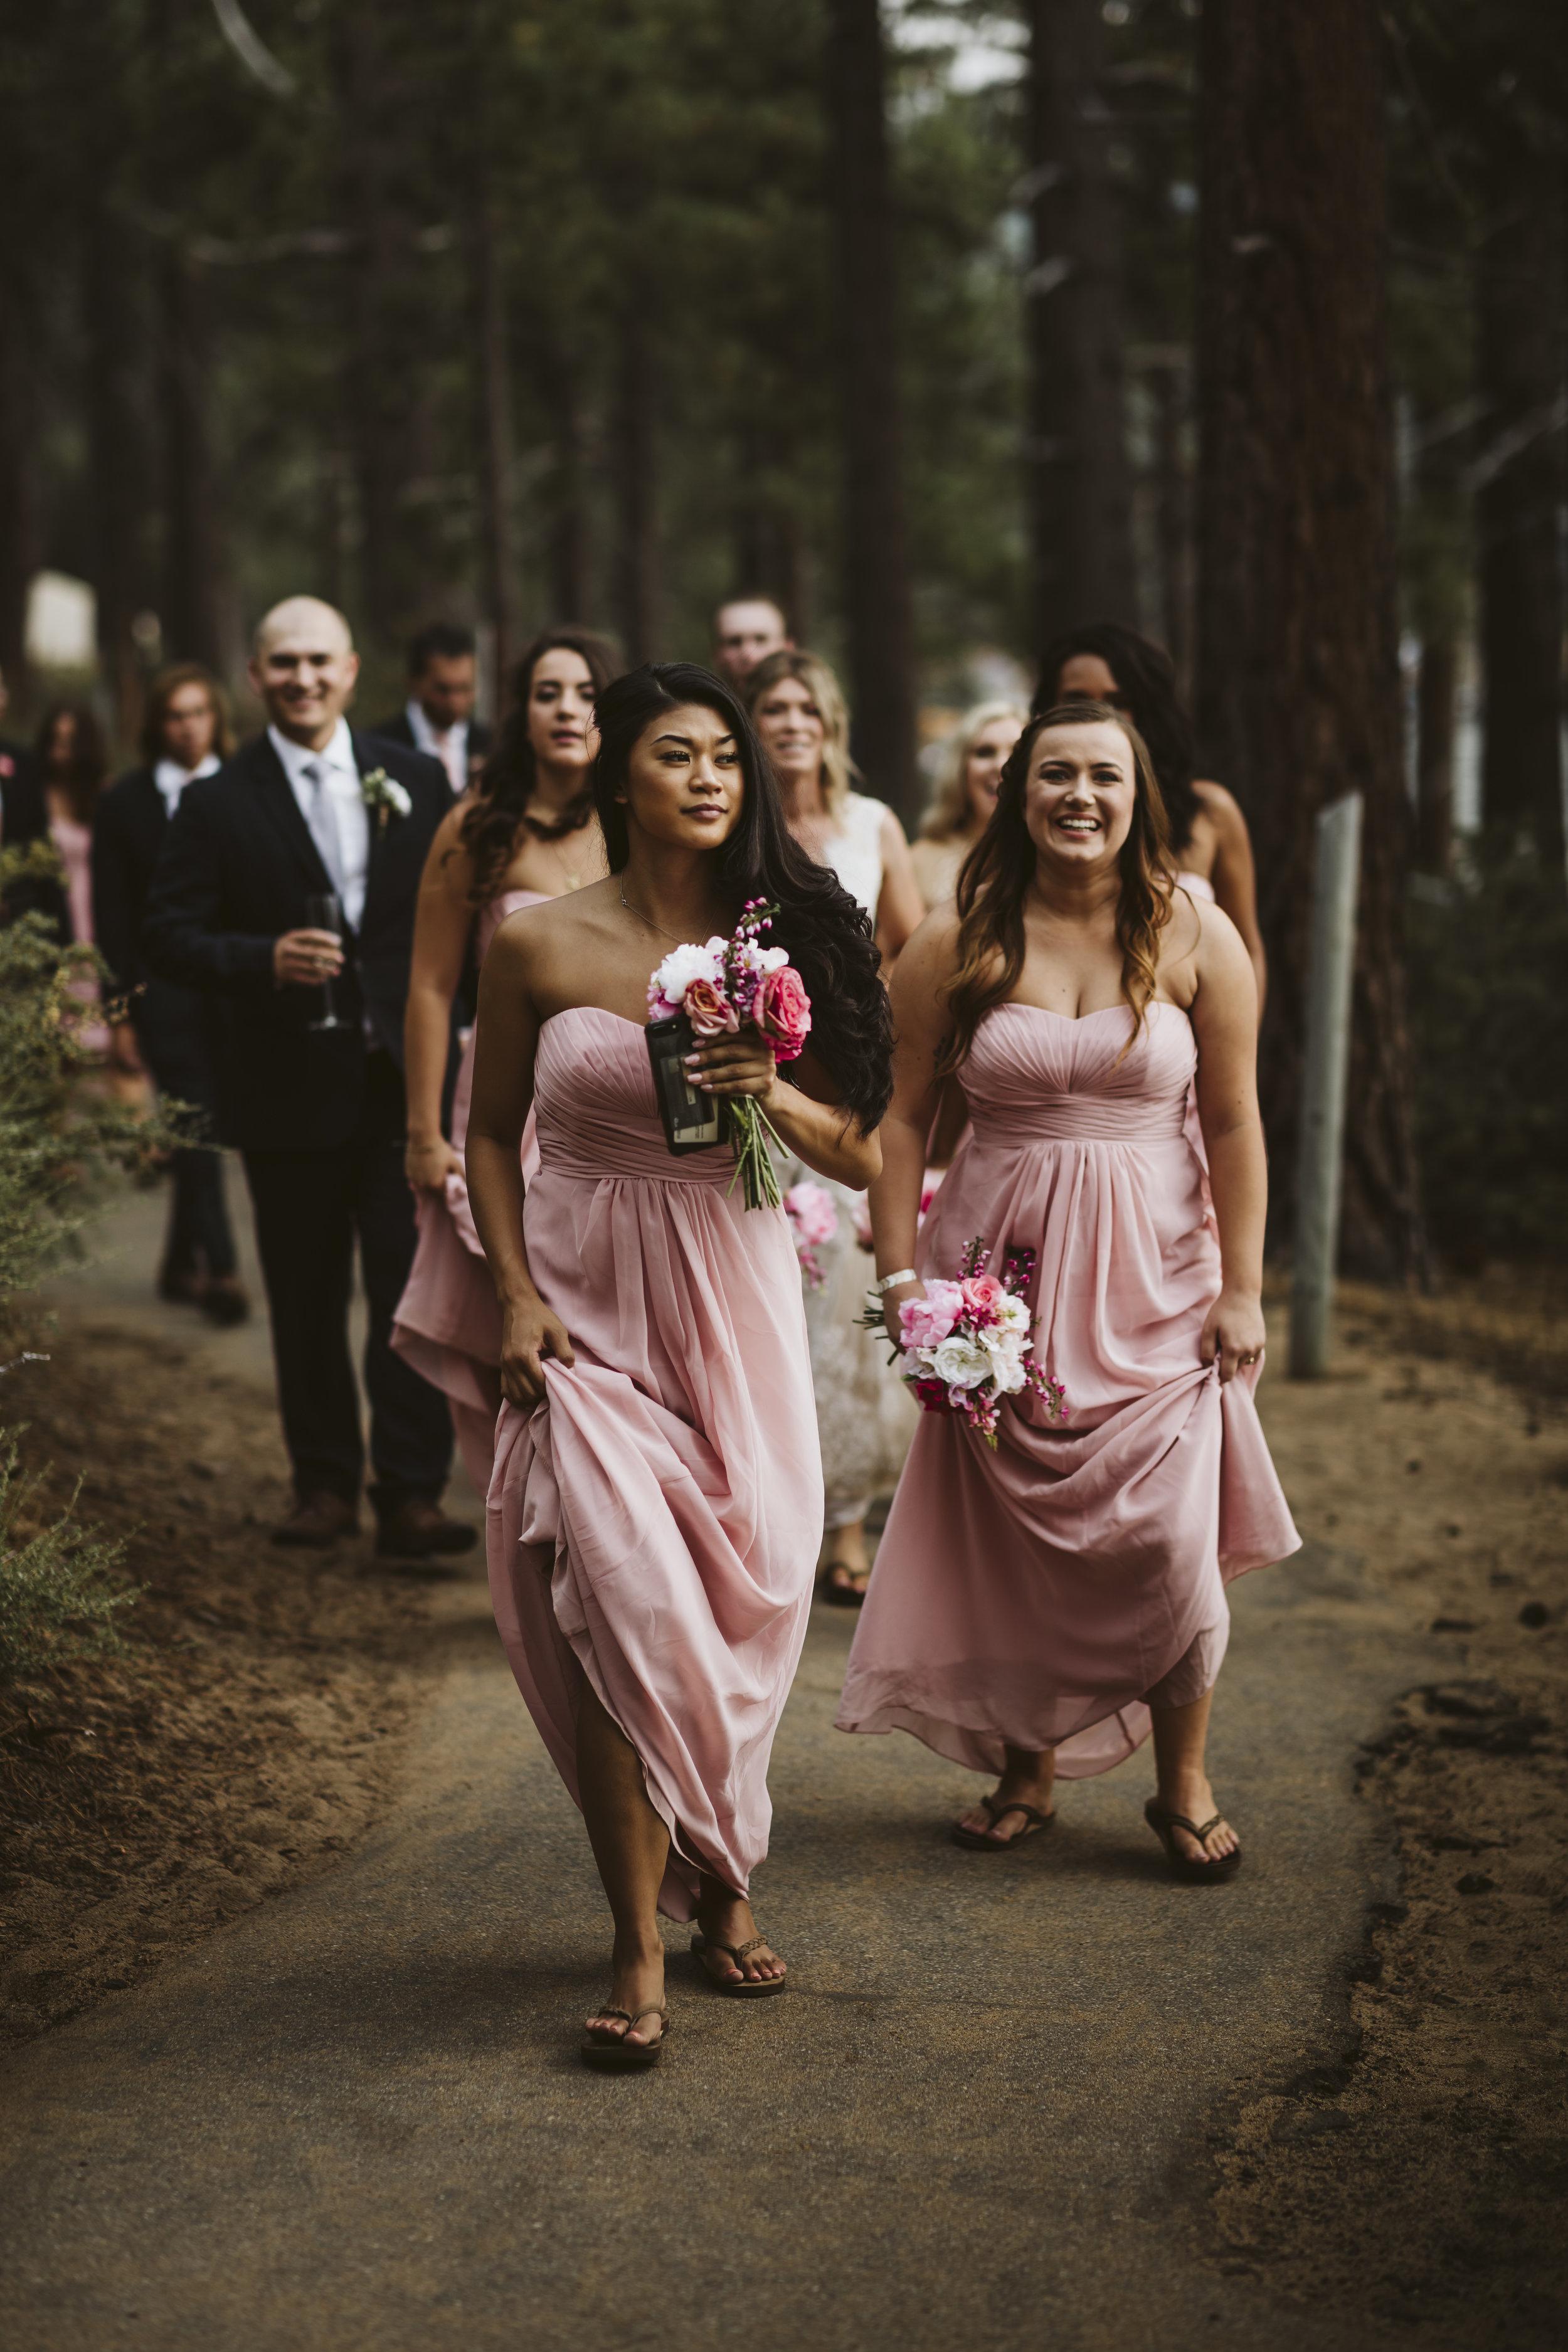 _P8A4328vild-vild photography-photography-wedding-wedding photography-tahoe-lake tahoe-lake tahoe wedding photographer-nevada wedding photographer-mountain wedding.jpg